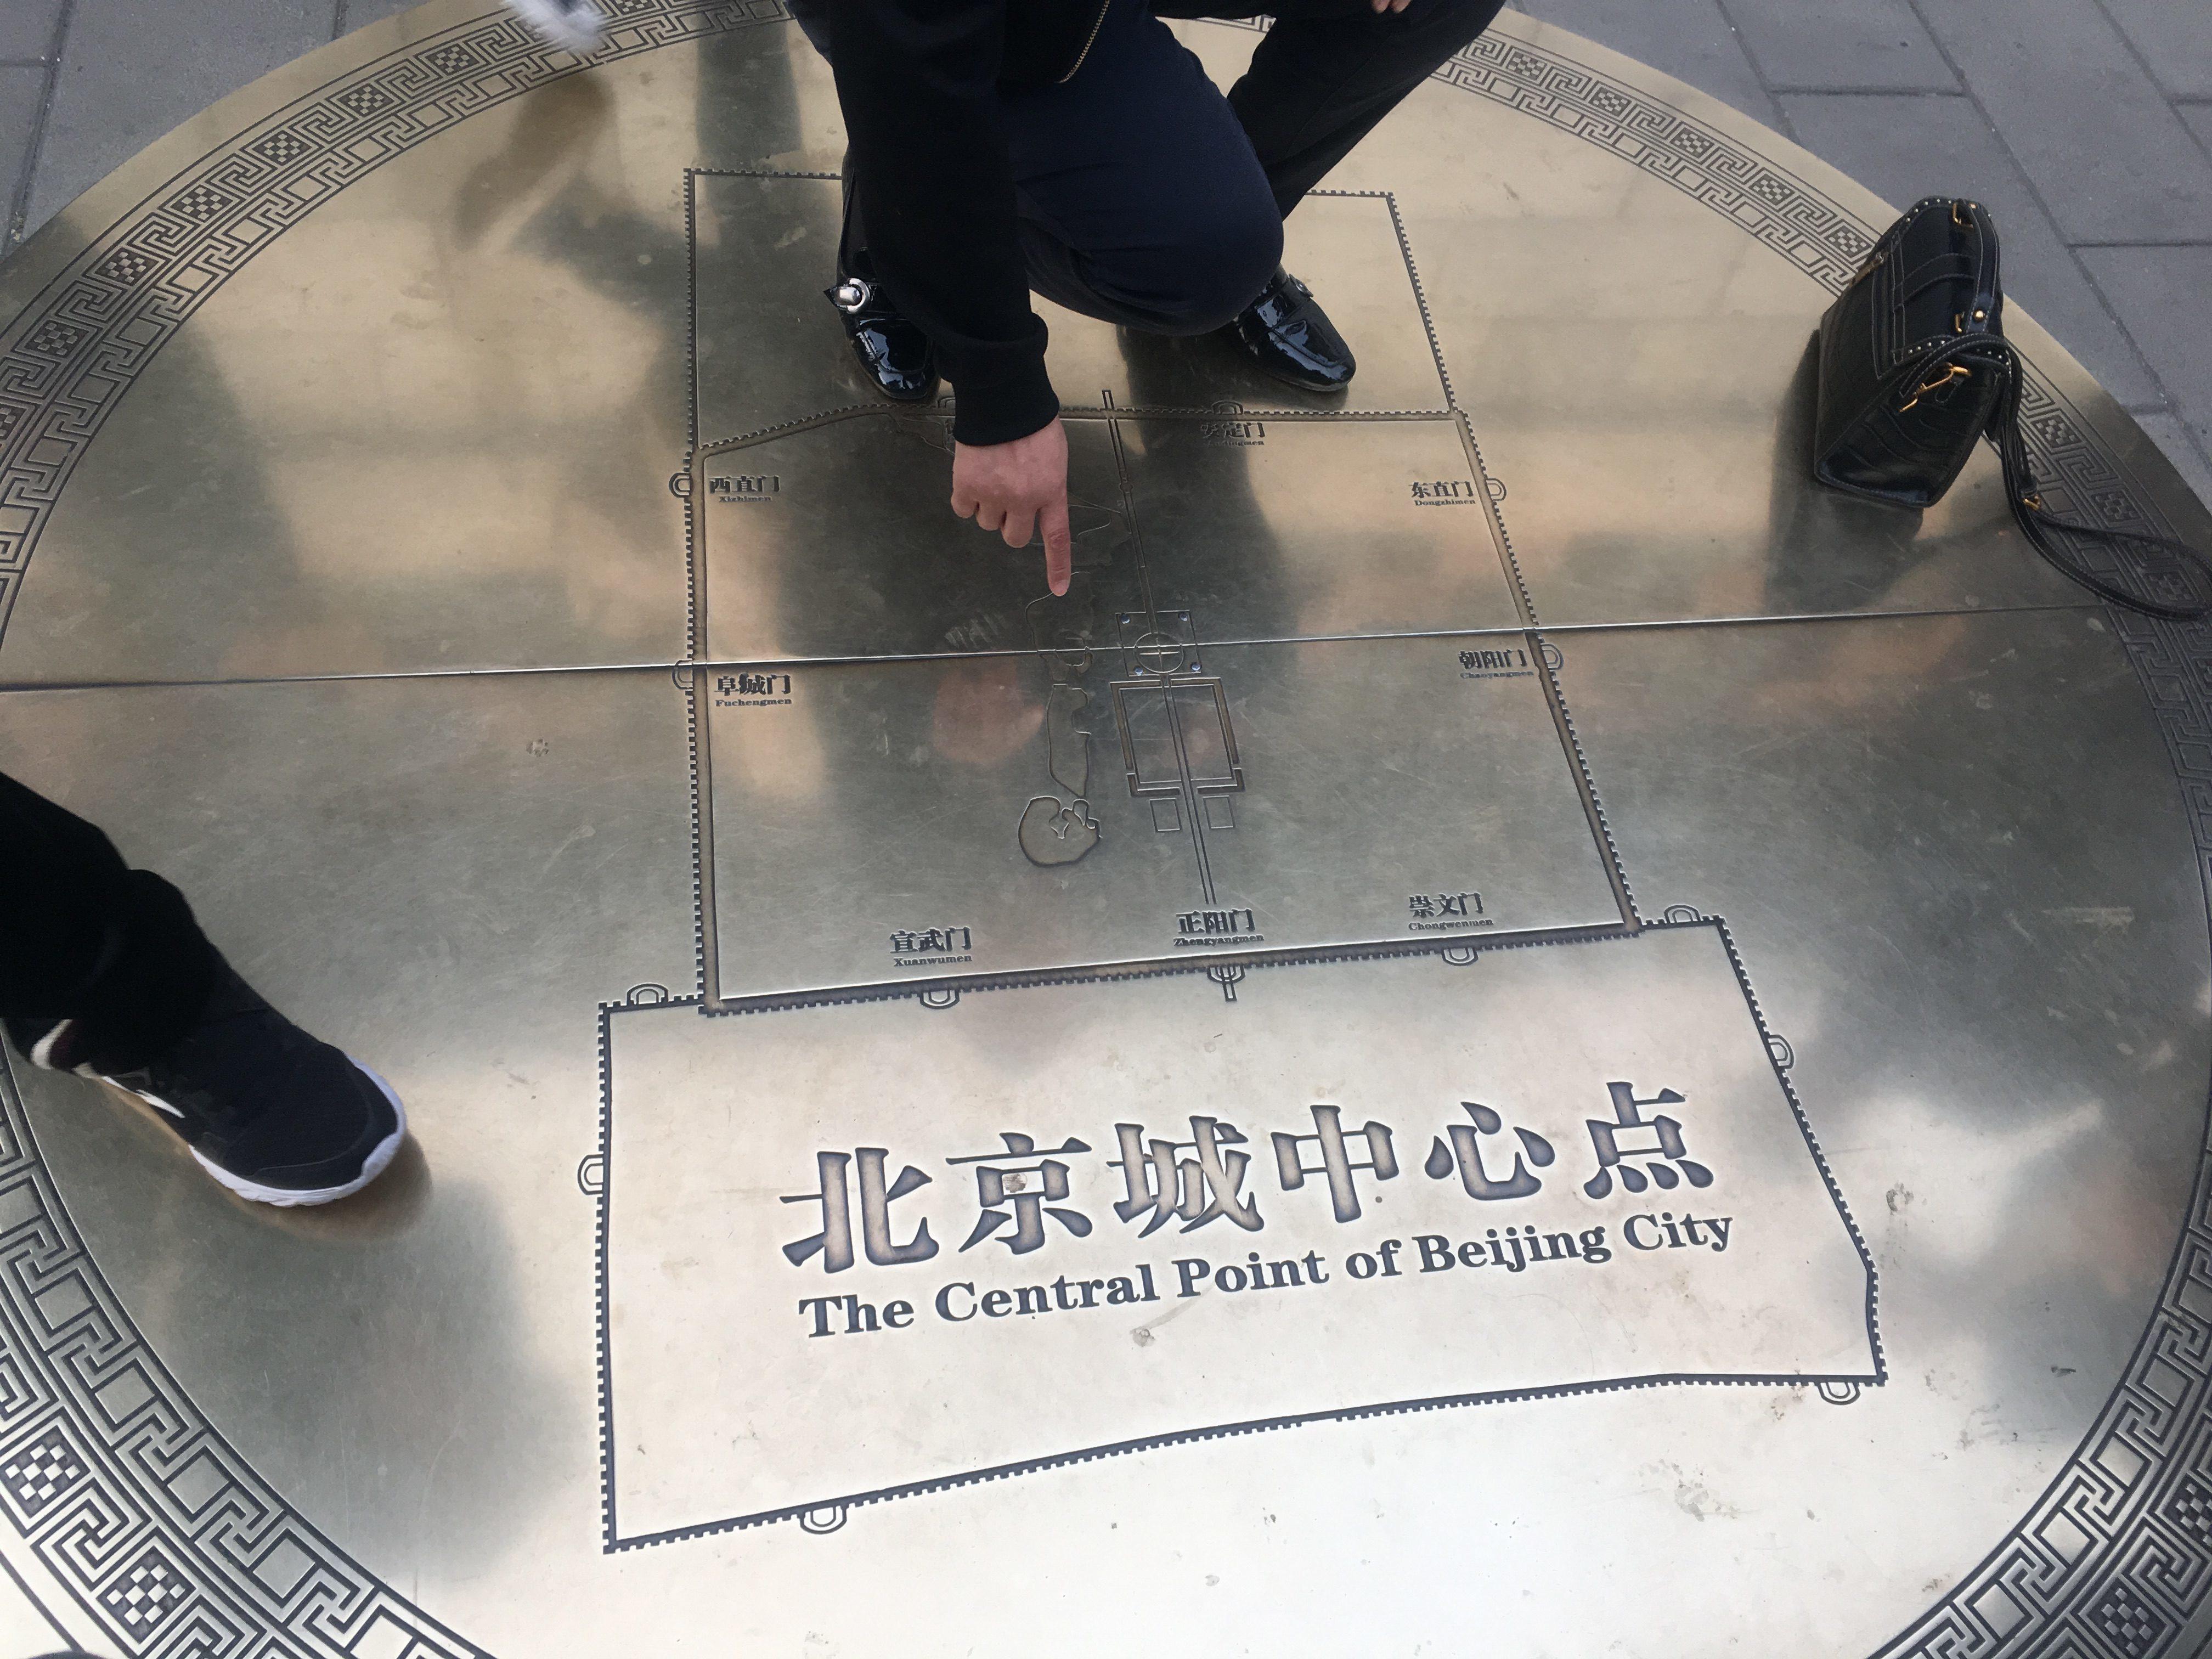 The big point of Beijing